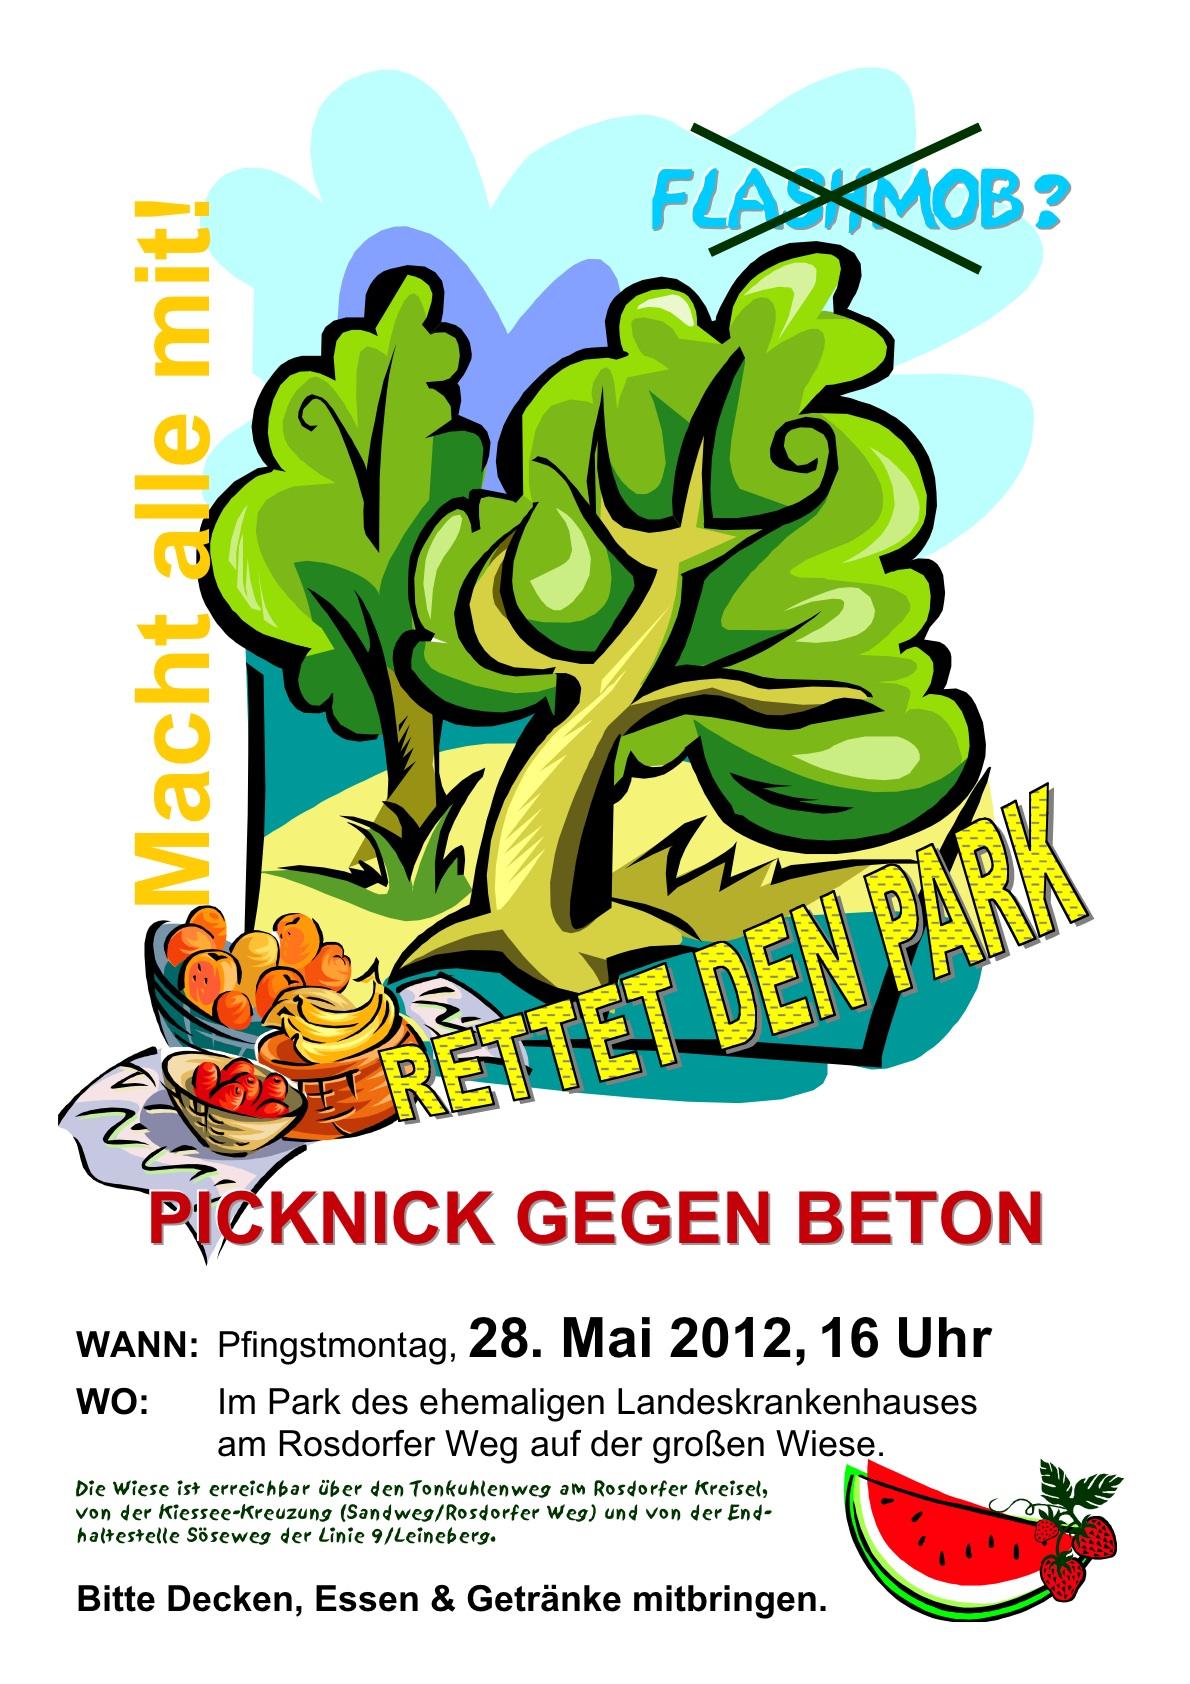 Rettet den Park des ehemaligen LKH Göttingen